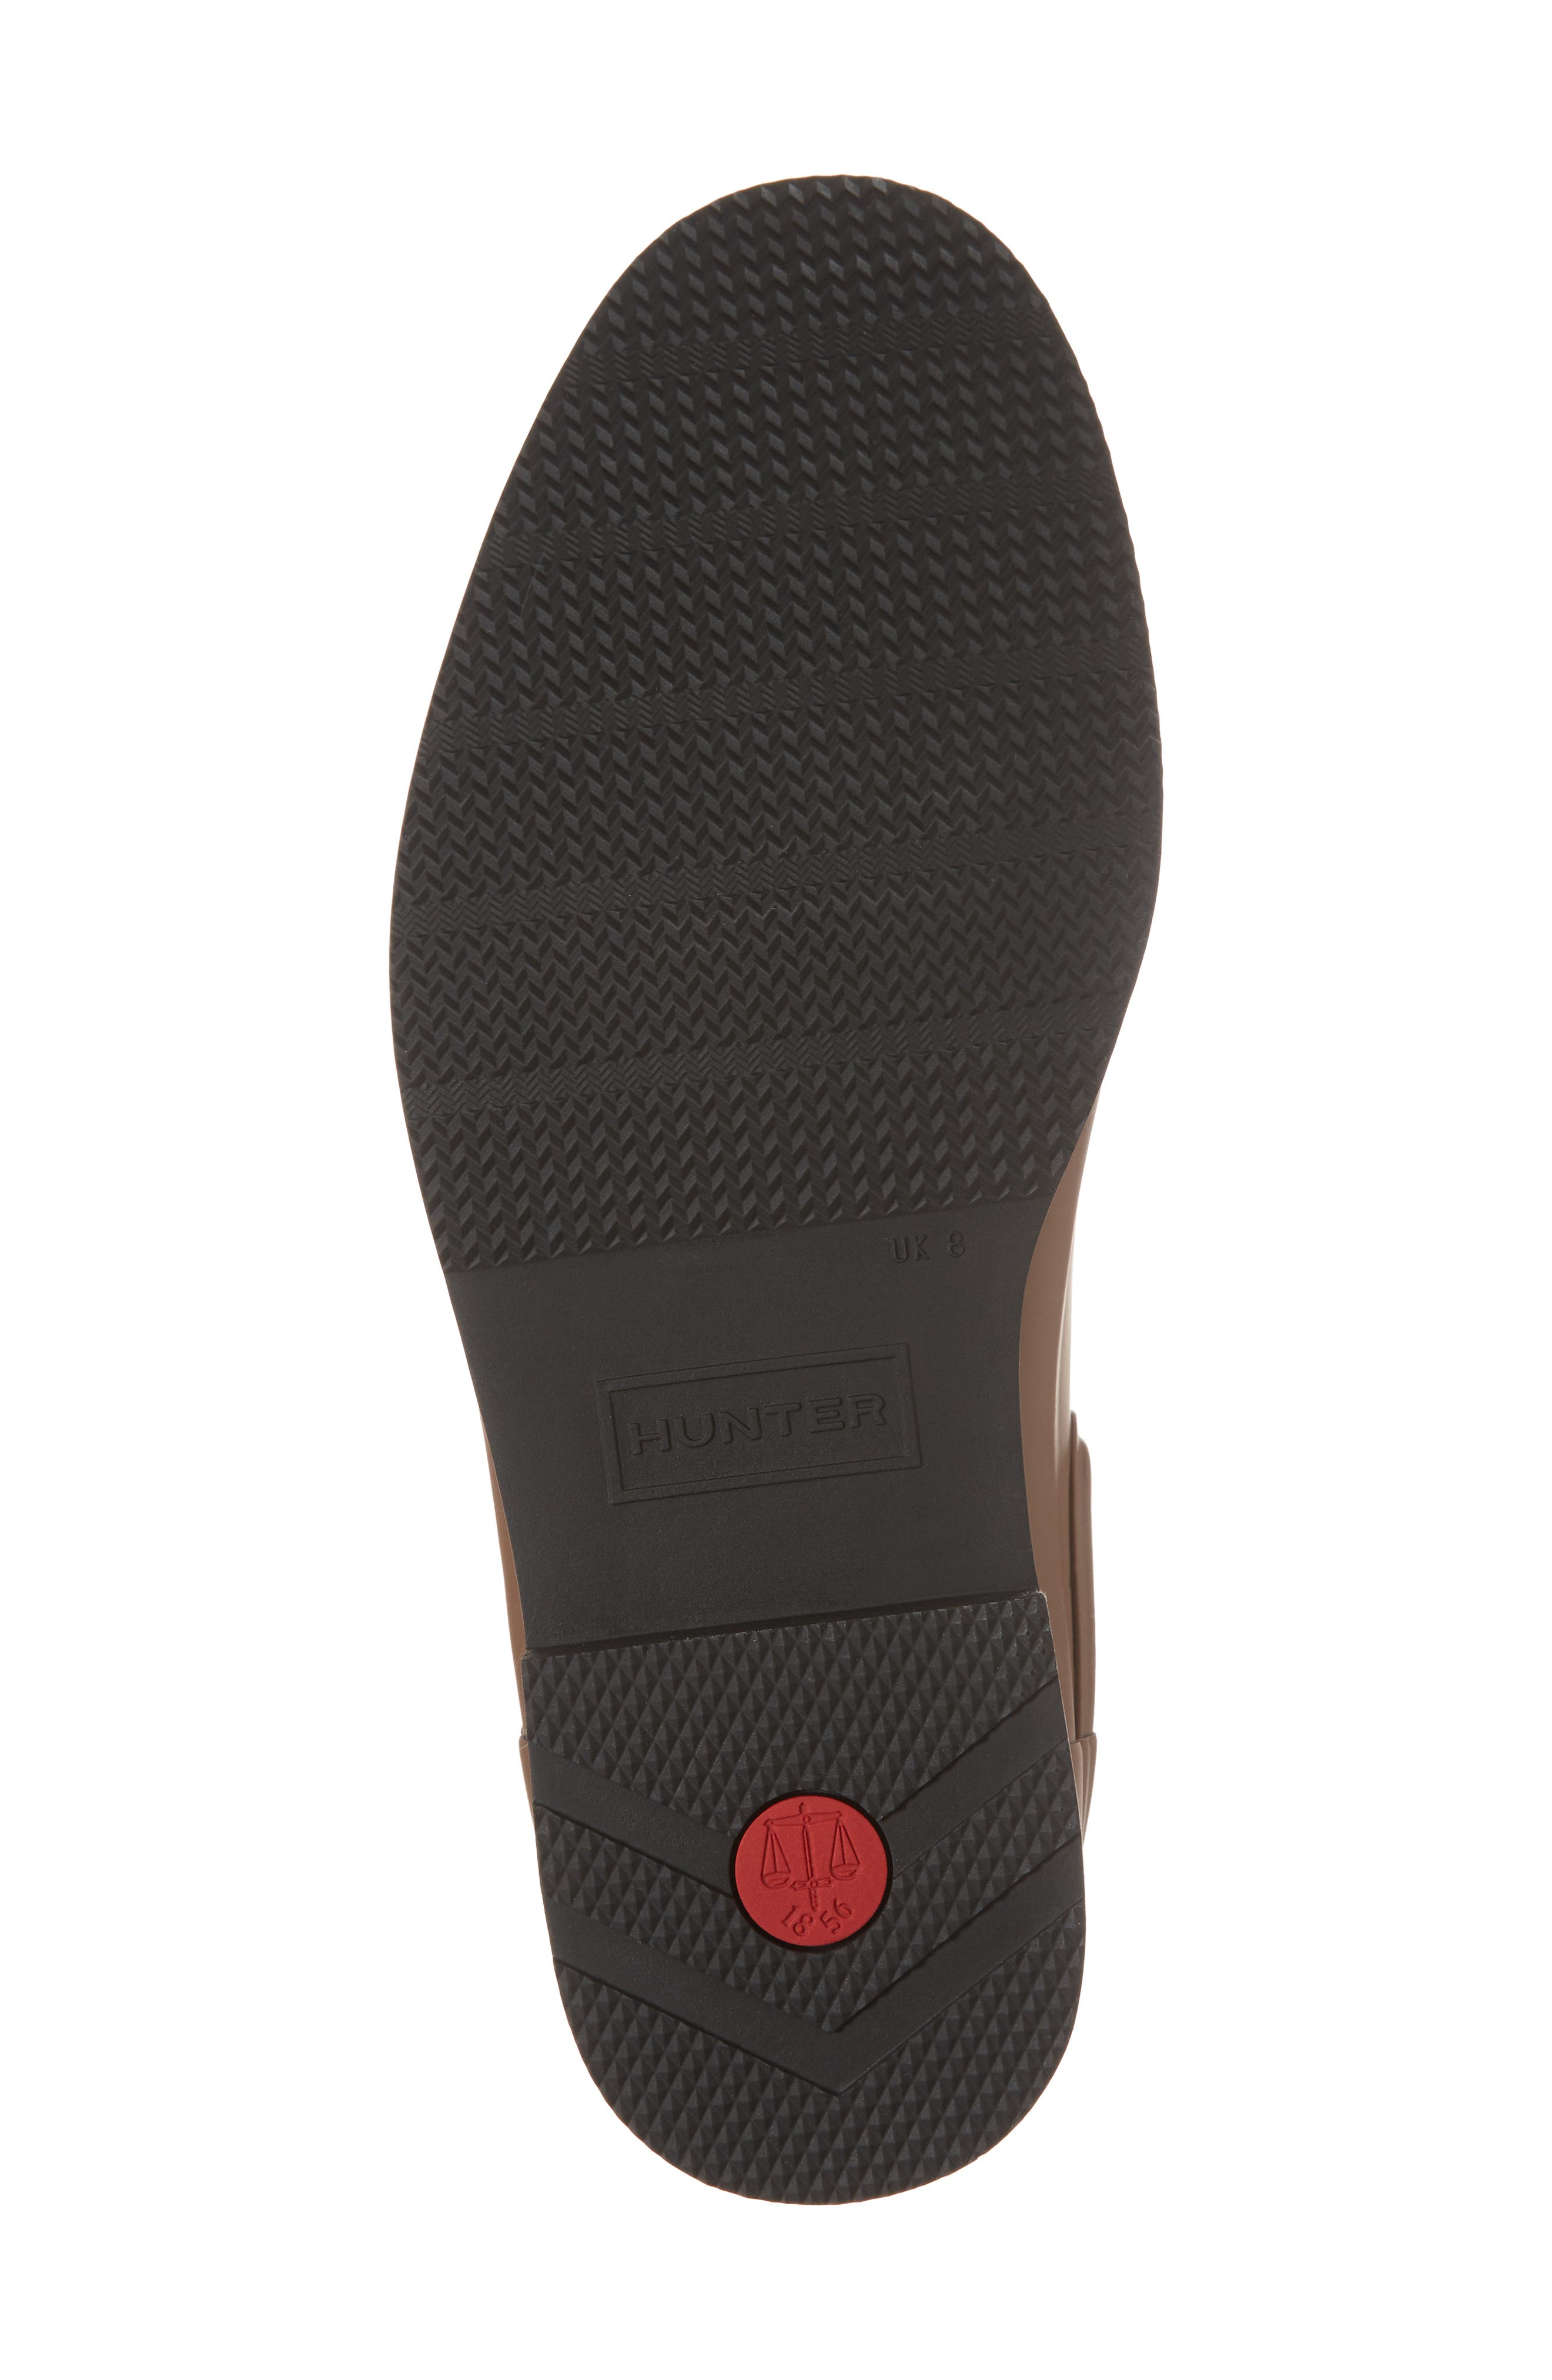 Original Refined Waterproof Chelsea Boot,                             Alternate thumbnail 6, color,                             Soil/ Black